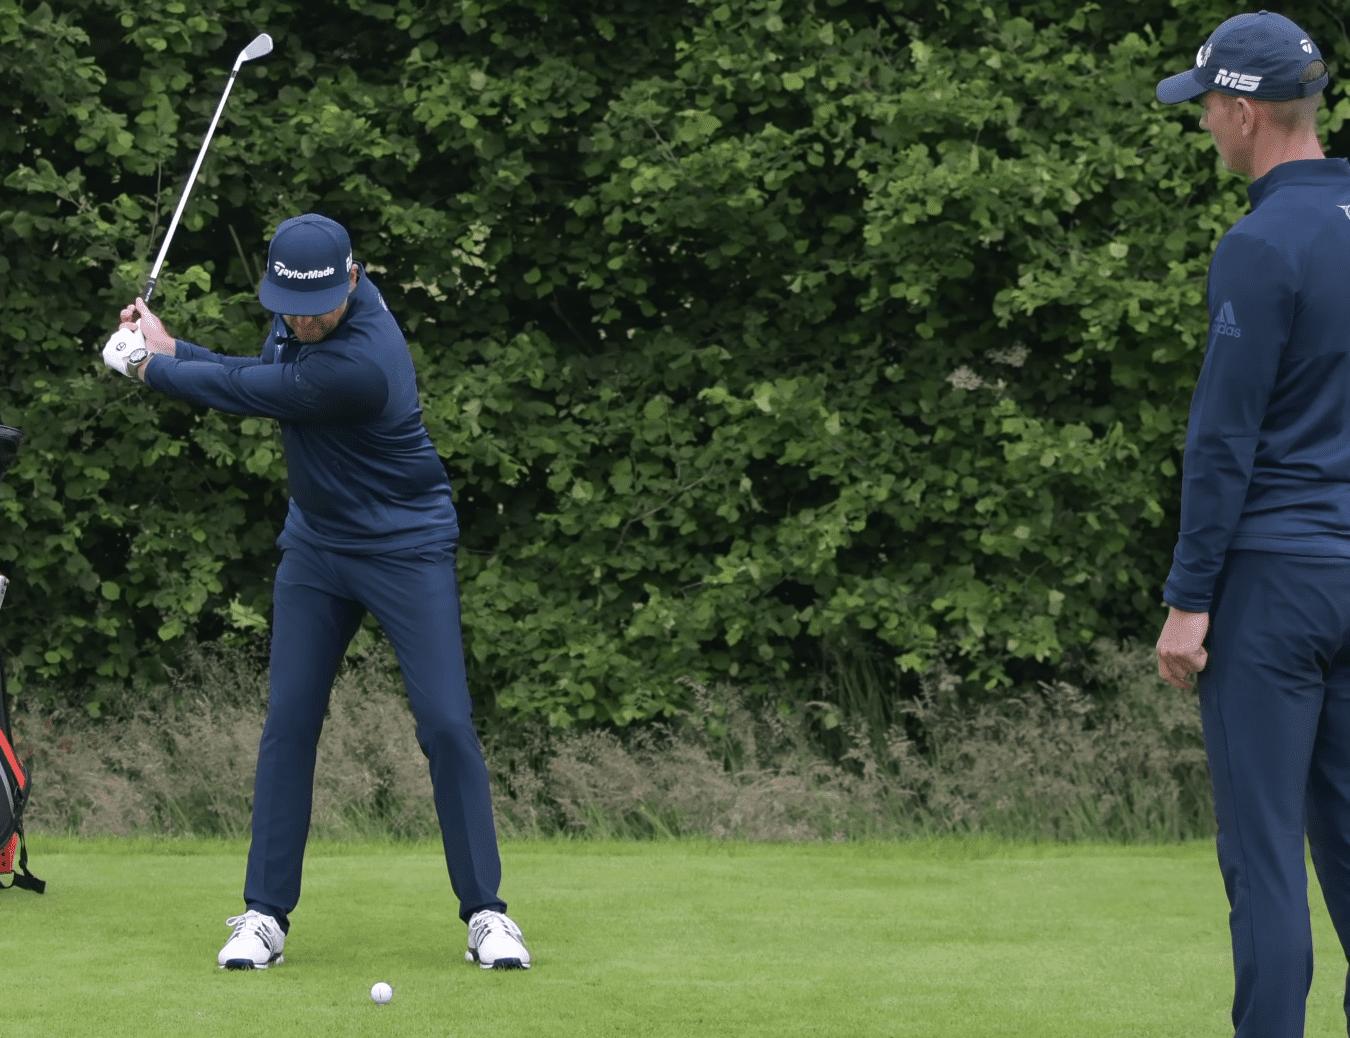 Stord golfbane